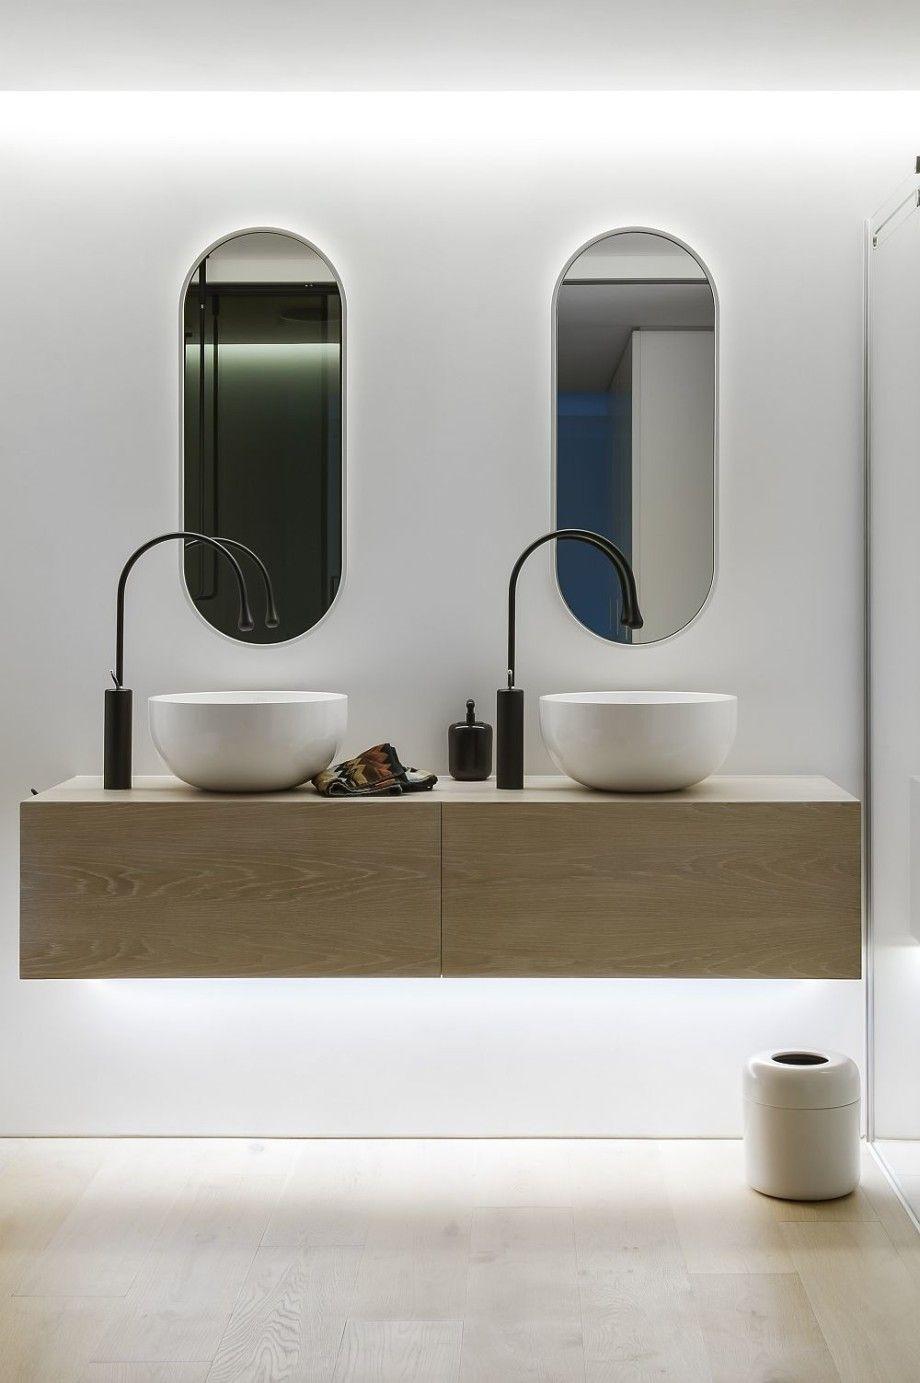 Quality vanity units bathroom - Bathroom Floating Wood Bathroom Vanity Unit Two Modern Sink With Single Handle Bronze Vessel Faucet